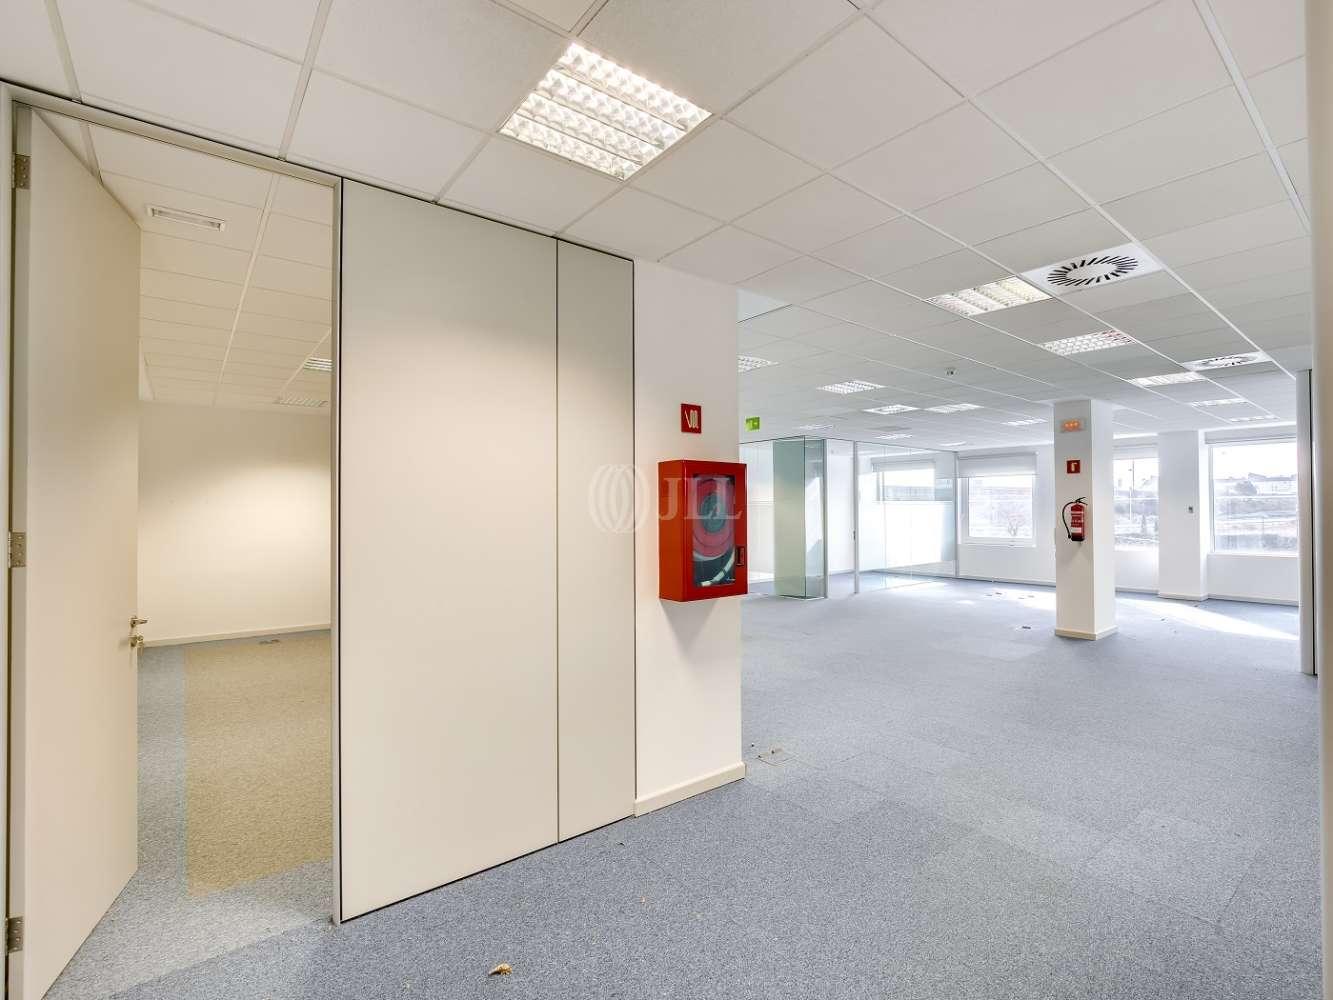 Oficina Las rozas de madrid, 28232 - Edificio 3. P.E. Alvia - 14363